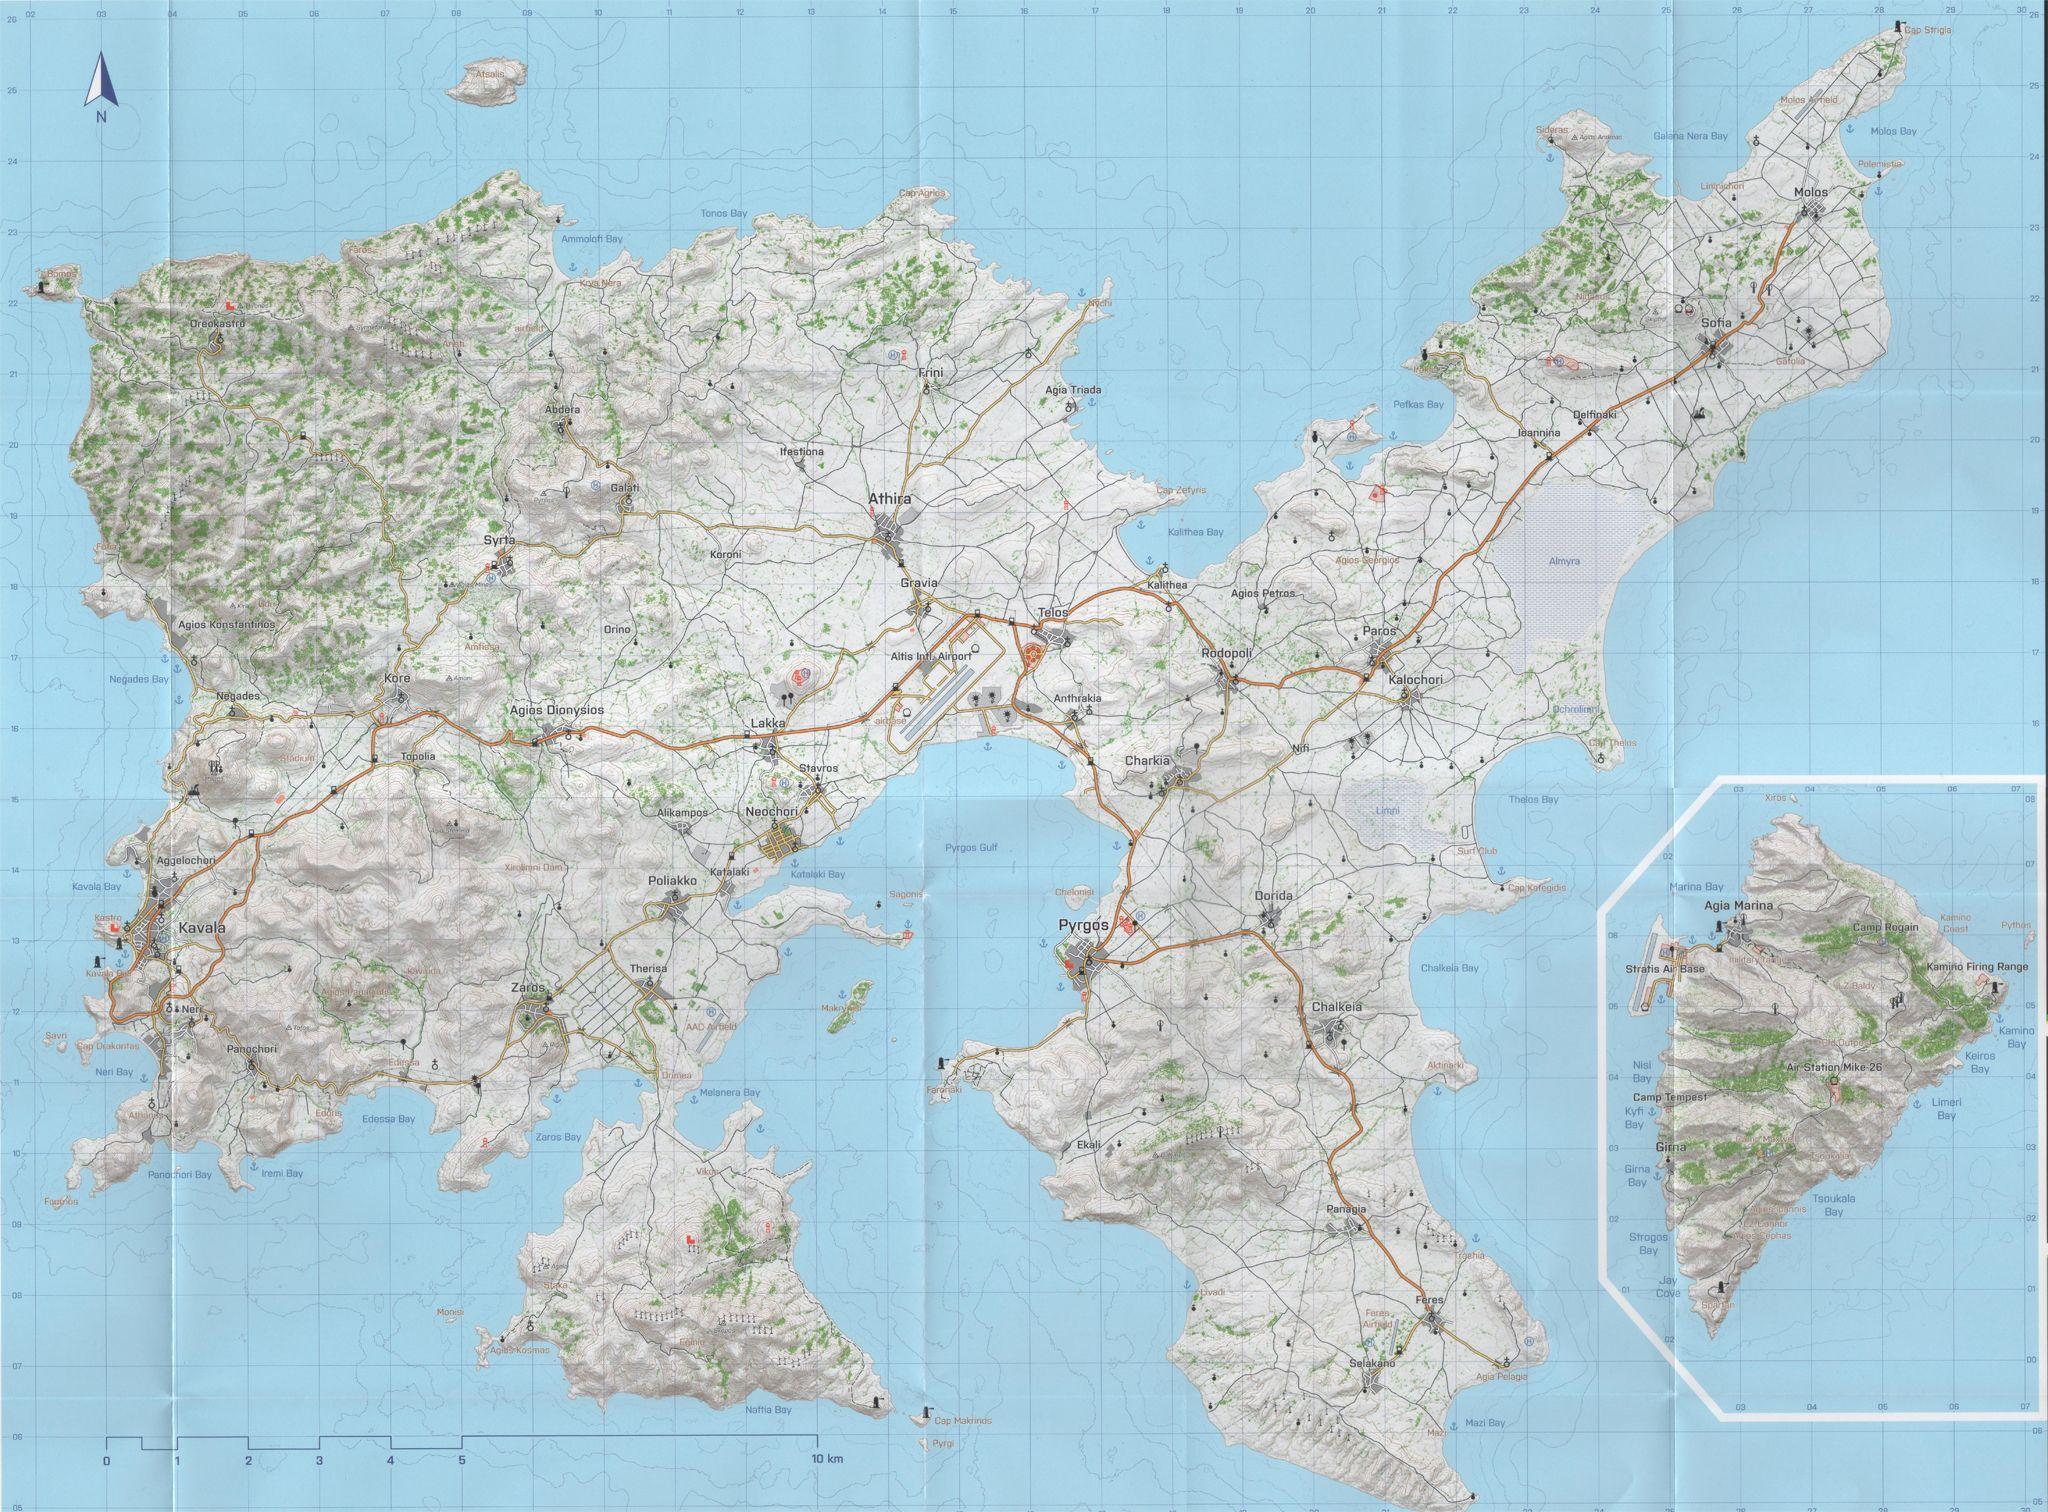 Arma 3 Map Arma 3 Map | Games And joy | Arma 3, Map, Diagram